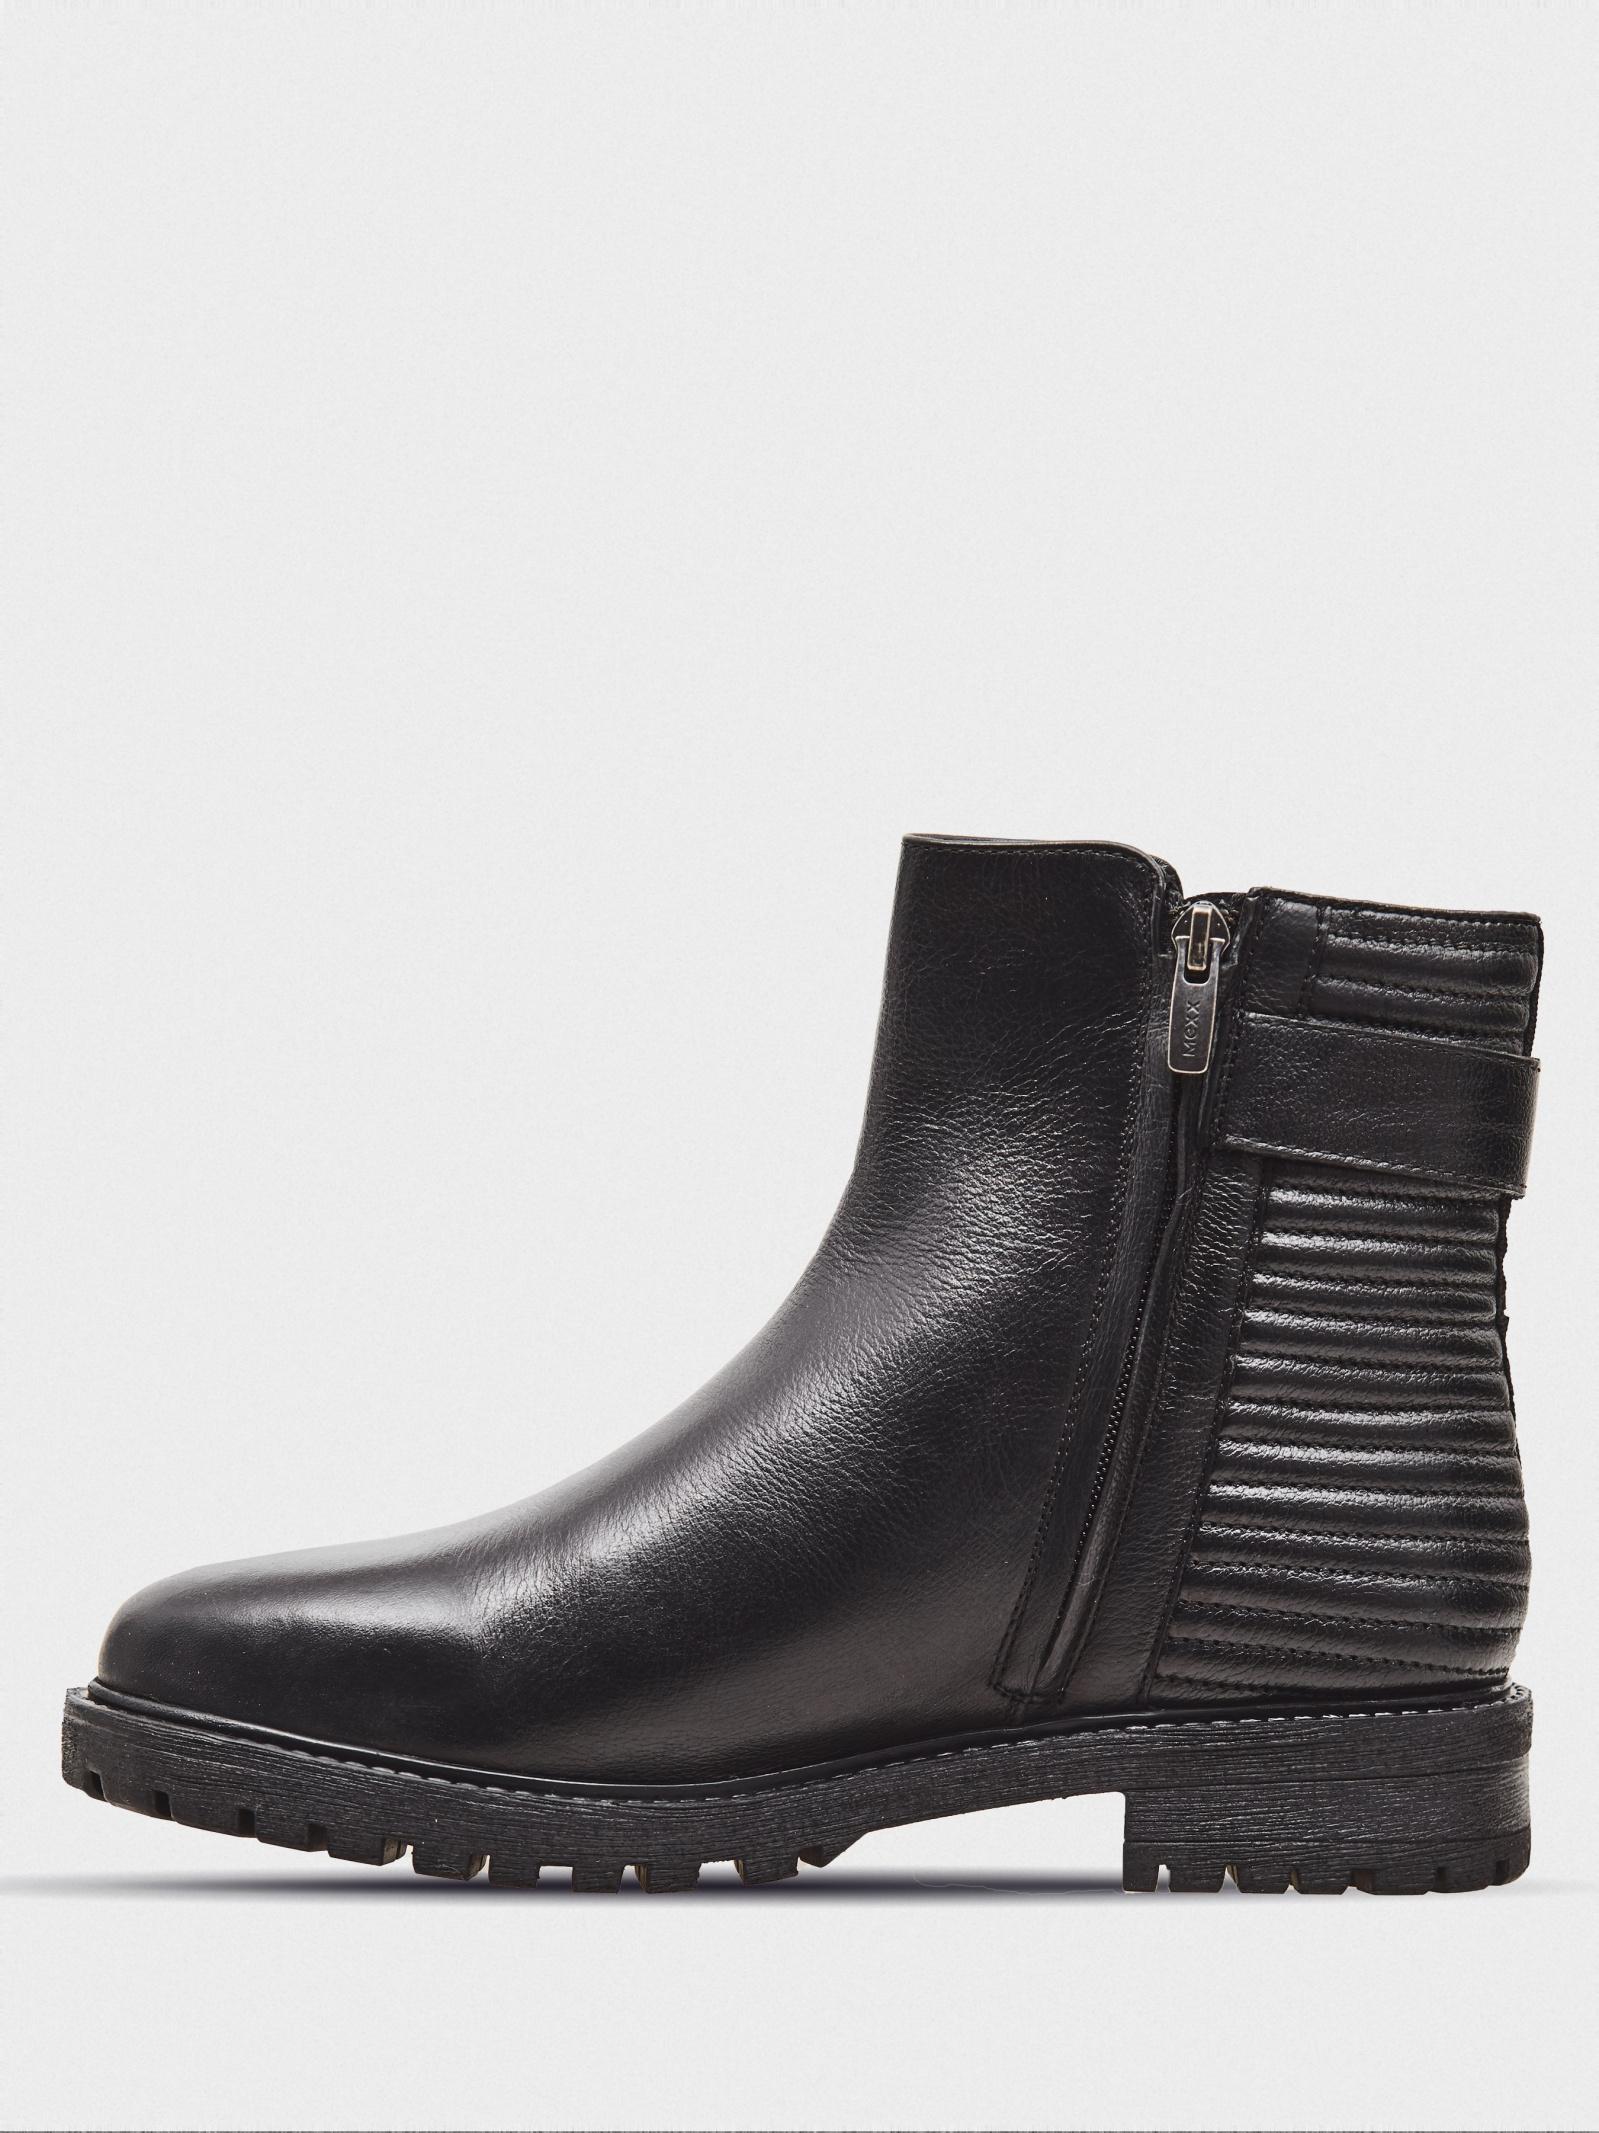 Ботинки для женщин MEXX 7L66 брендовые, 2017